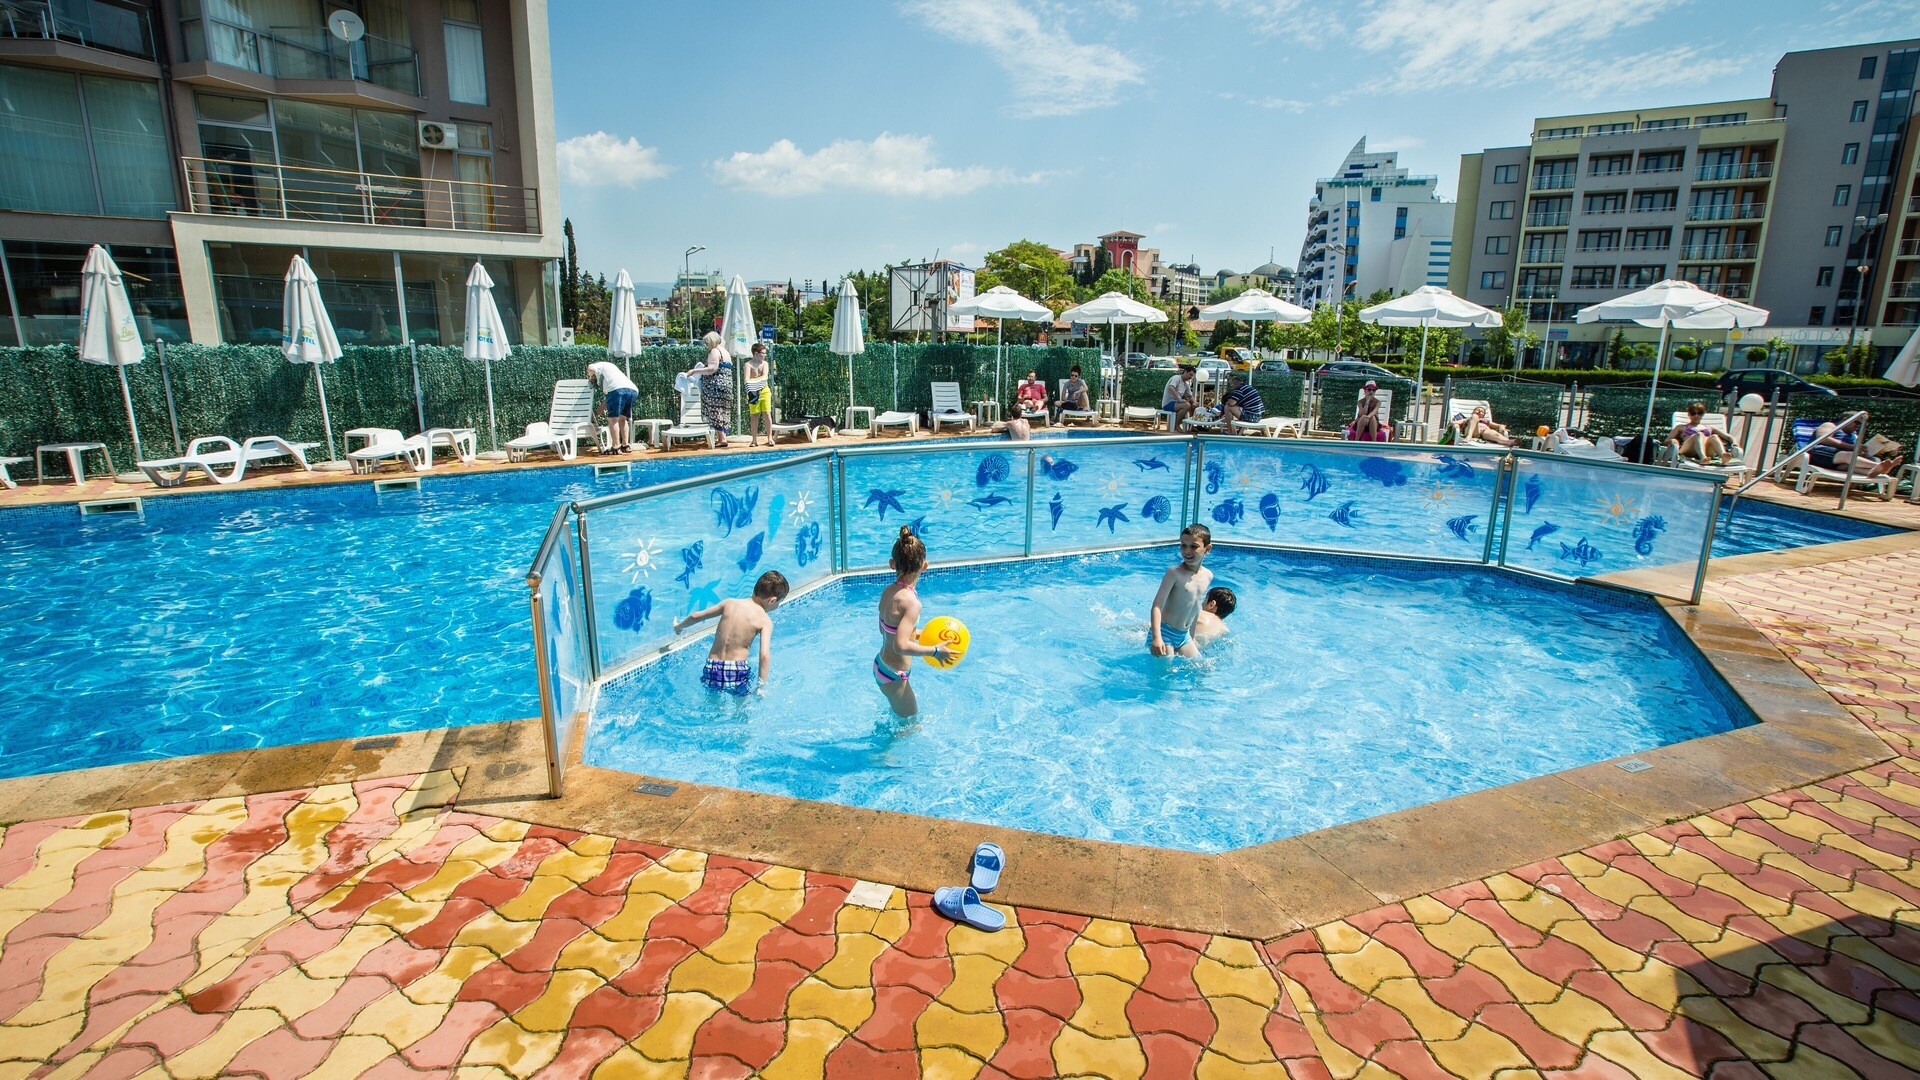 Хотел Бохеми - басейн